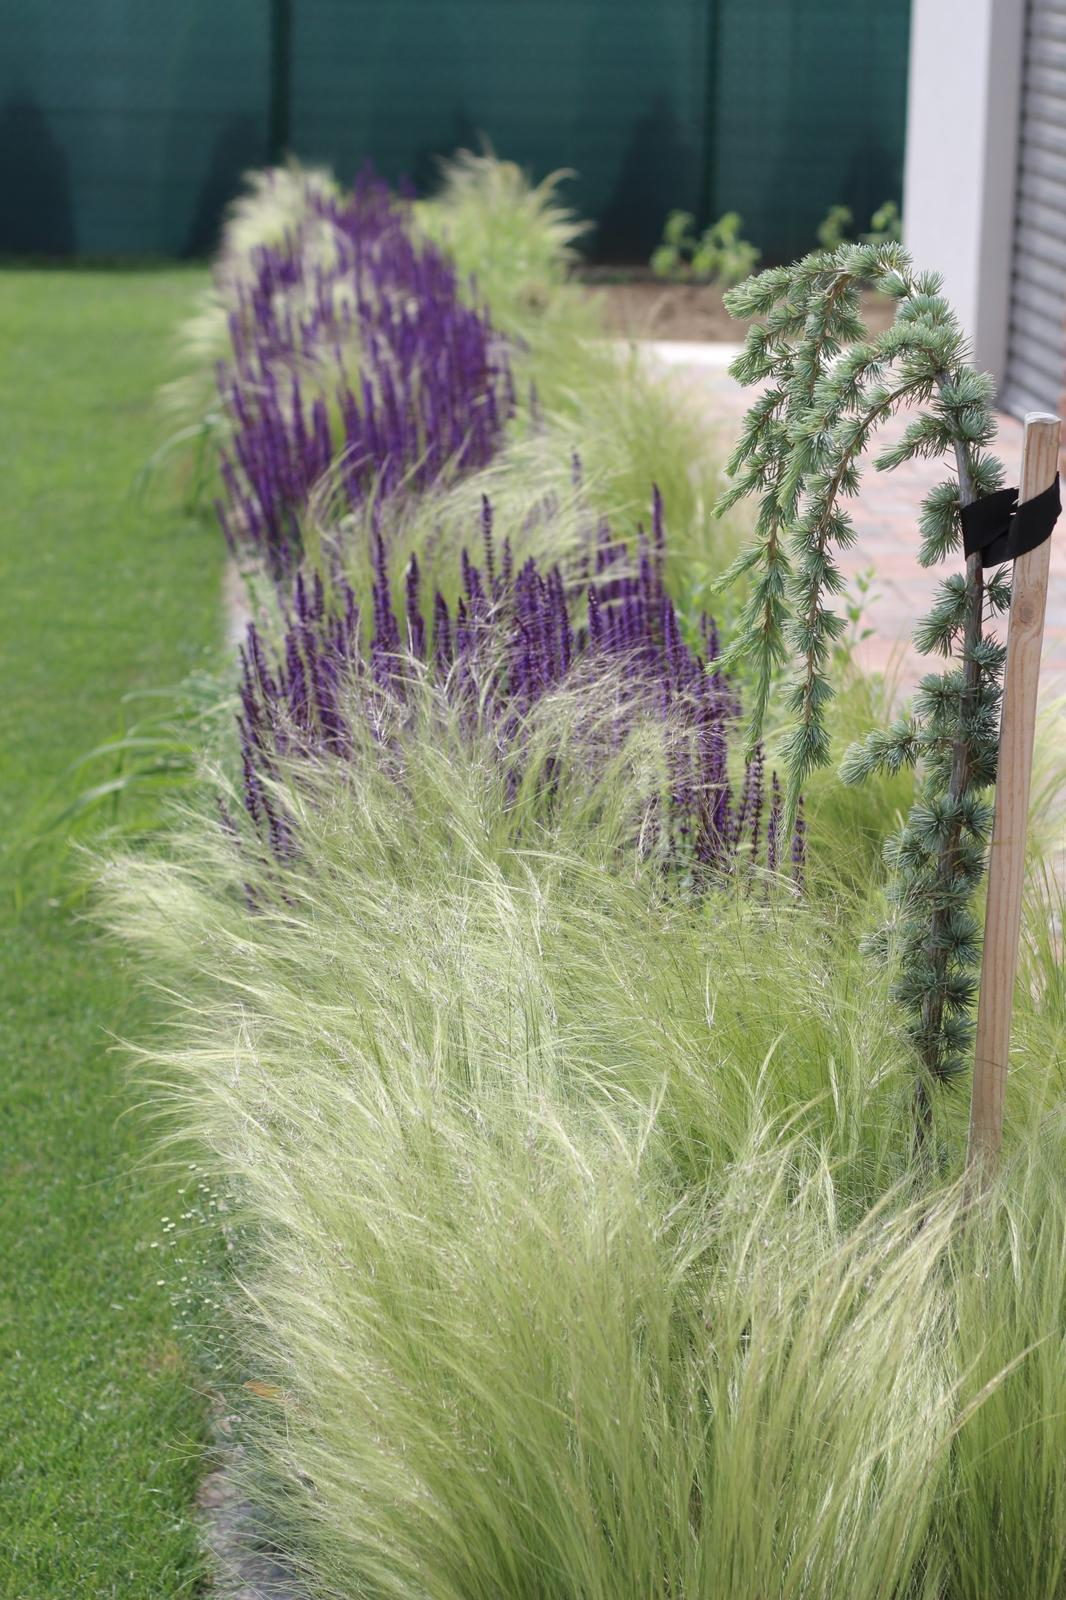 Exteriér - záhrada - Obrázok č. 131